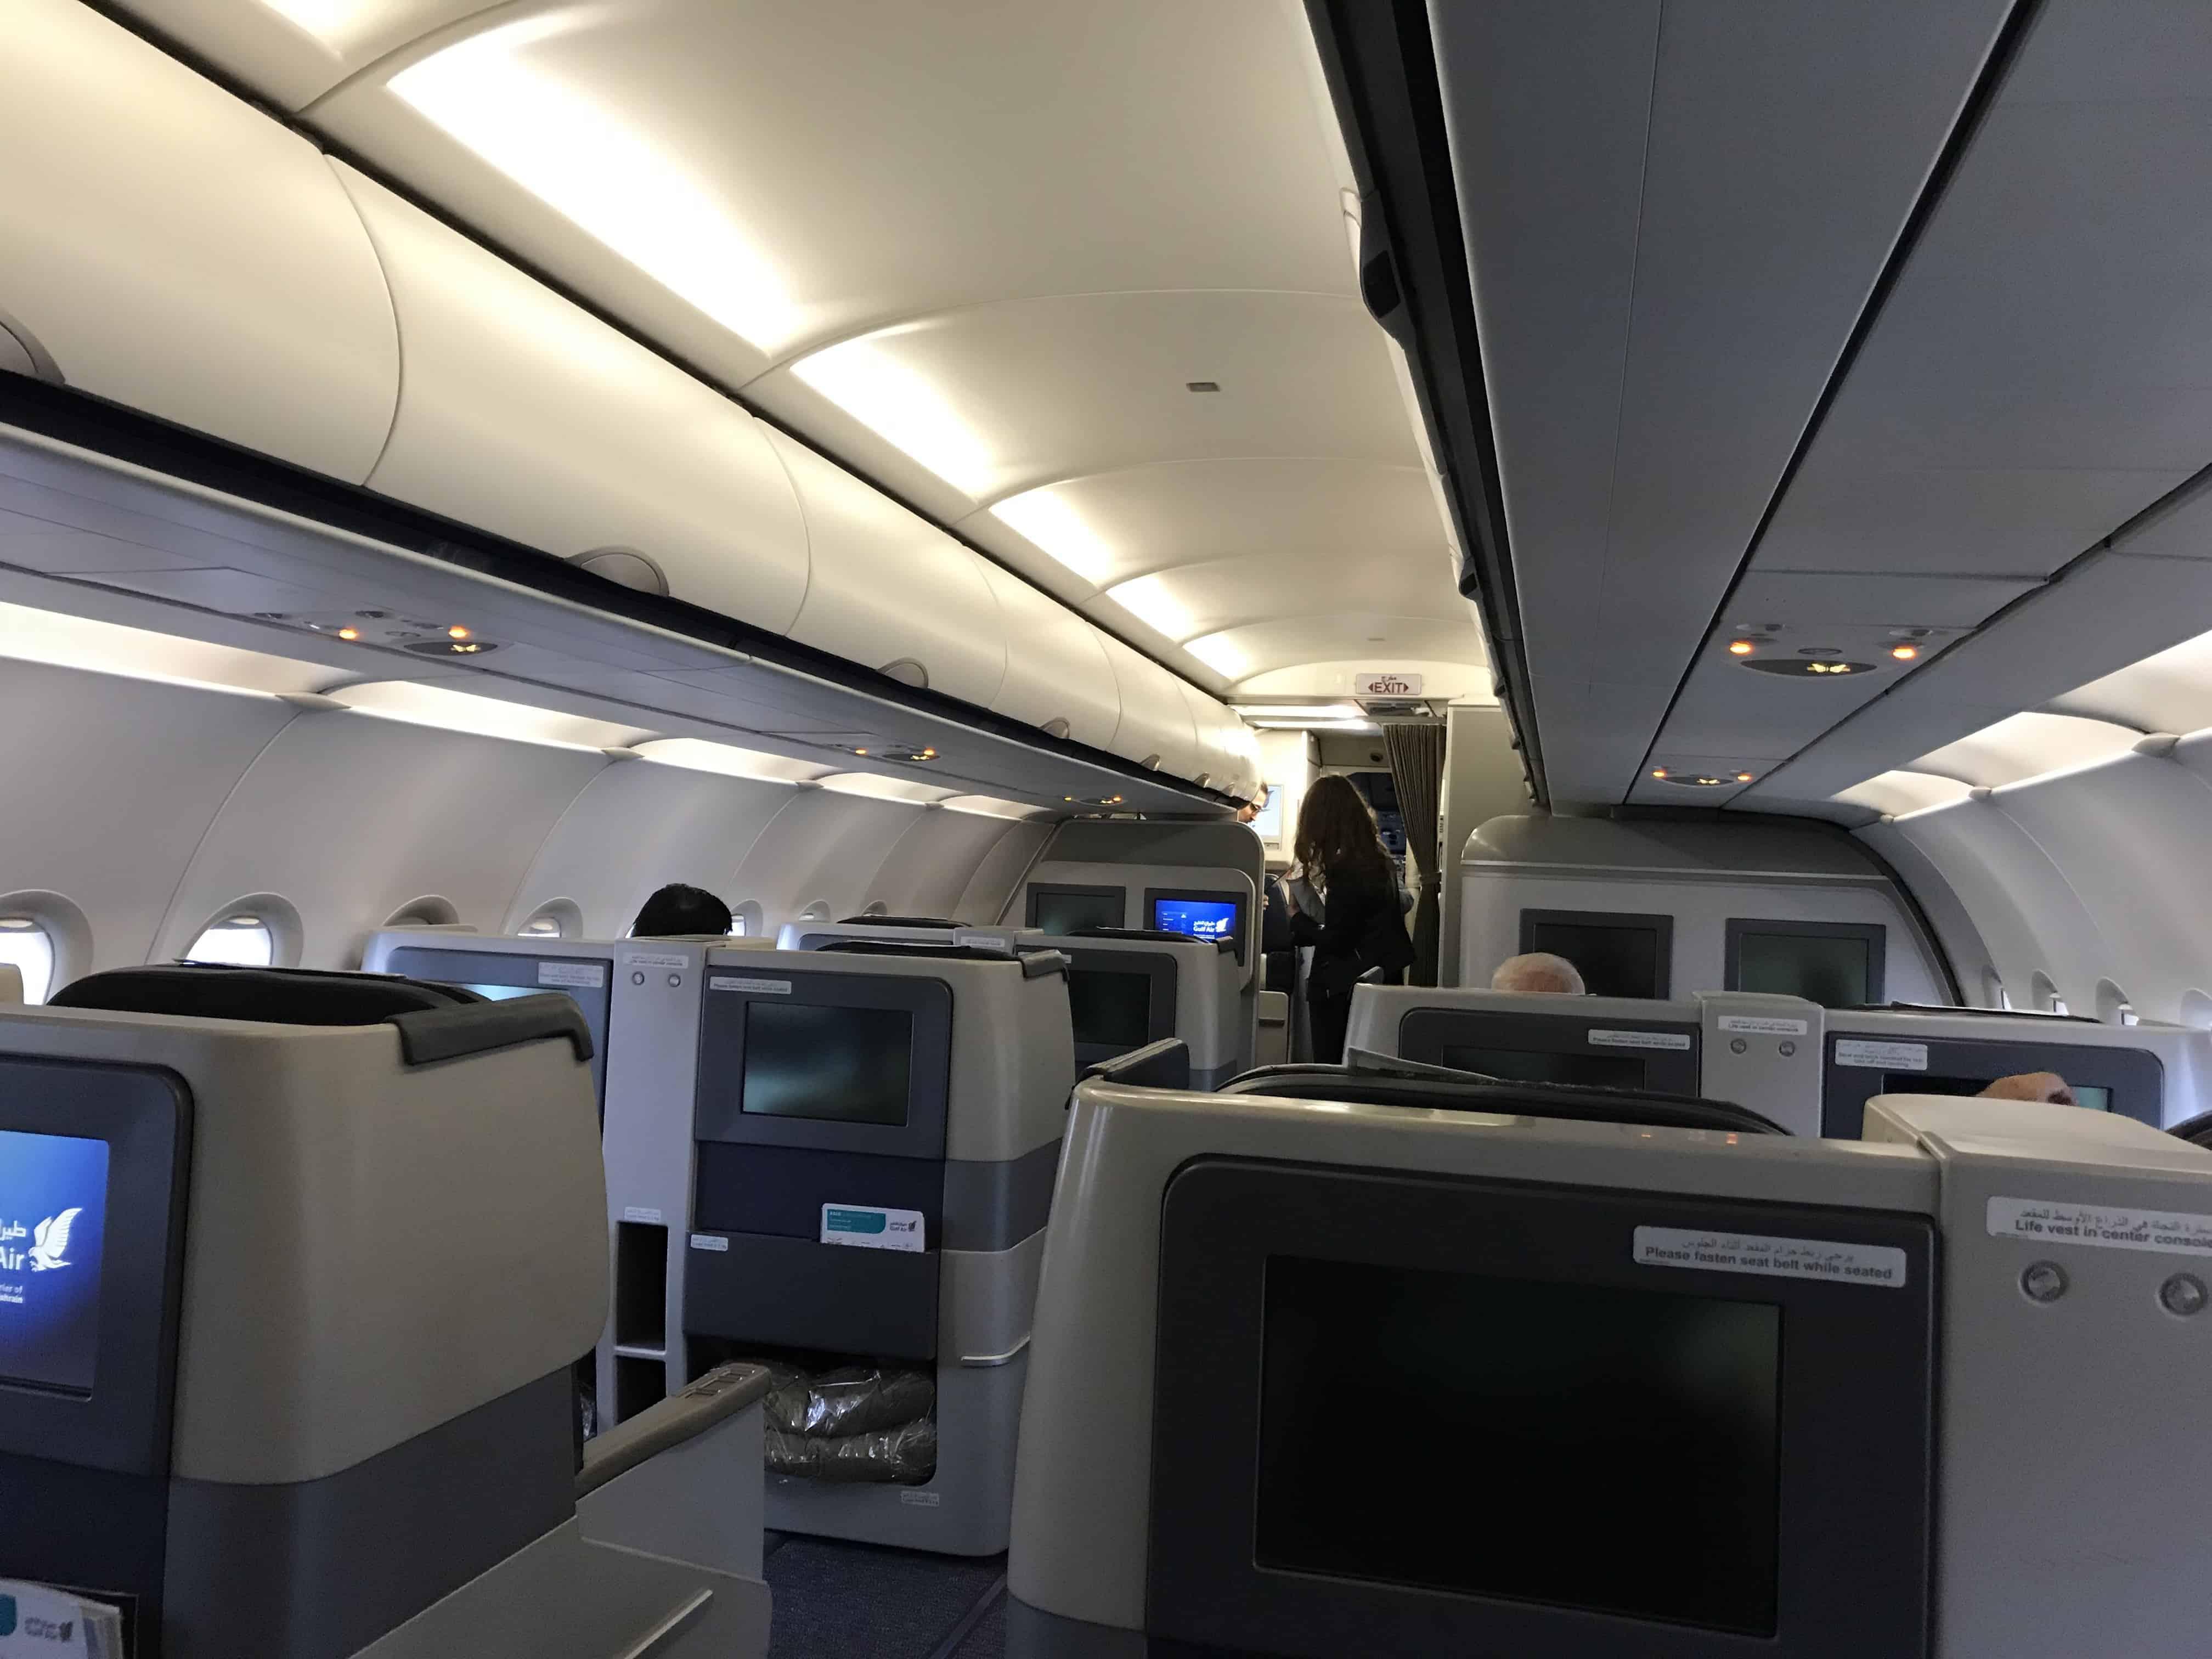 Gulf Air Bewertung - Kabine